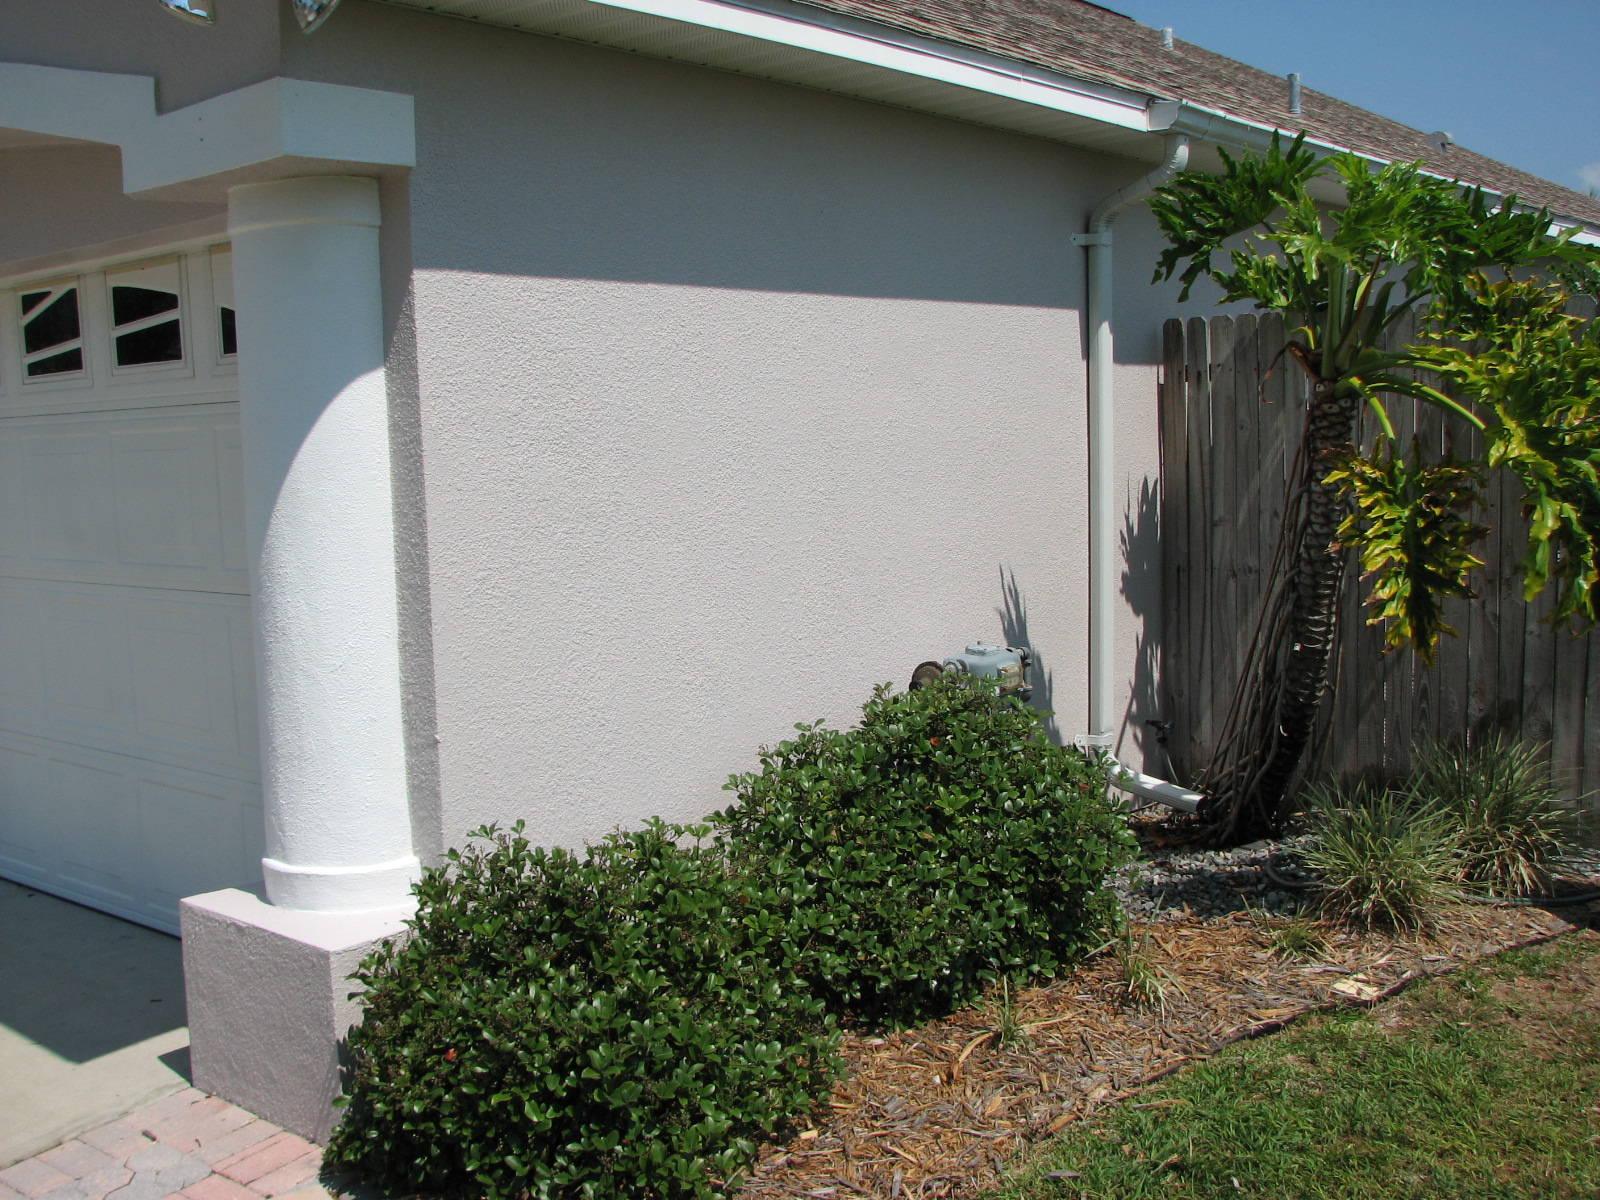 Merritt Island Stucco Repair and Exterior Painting- Bef